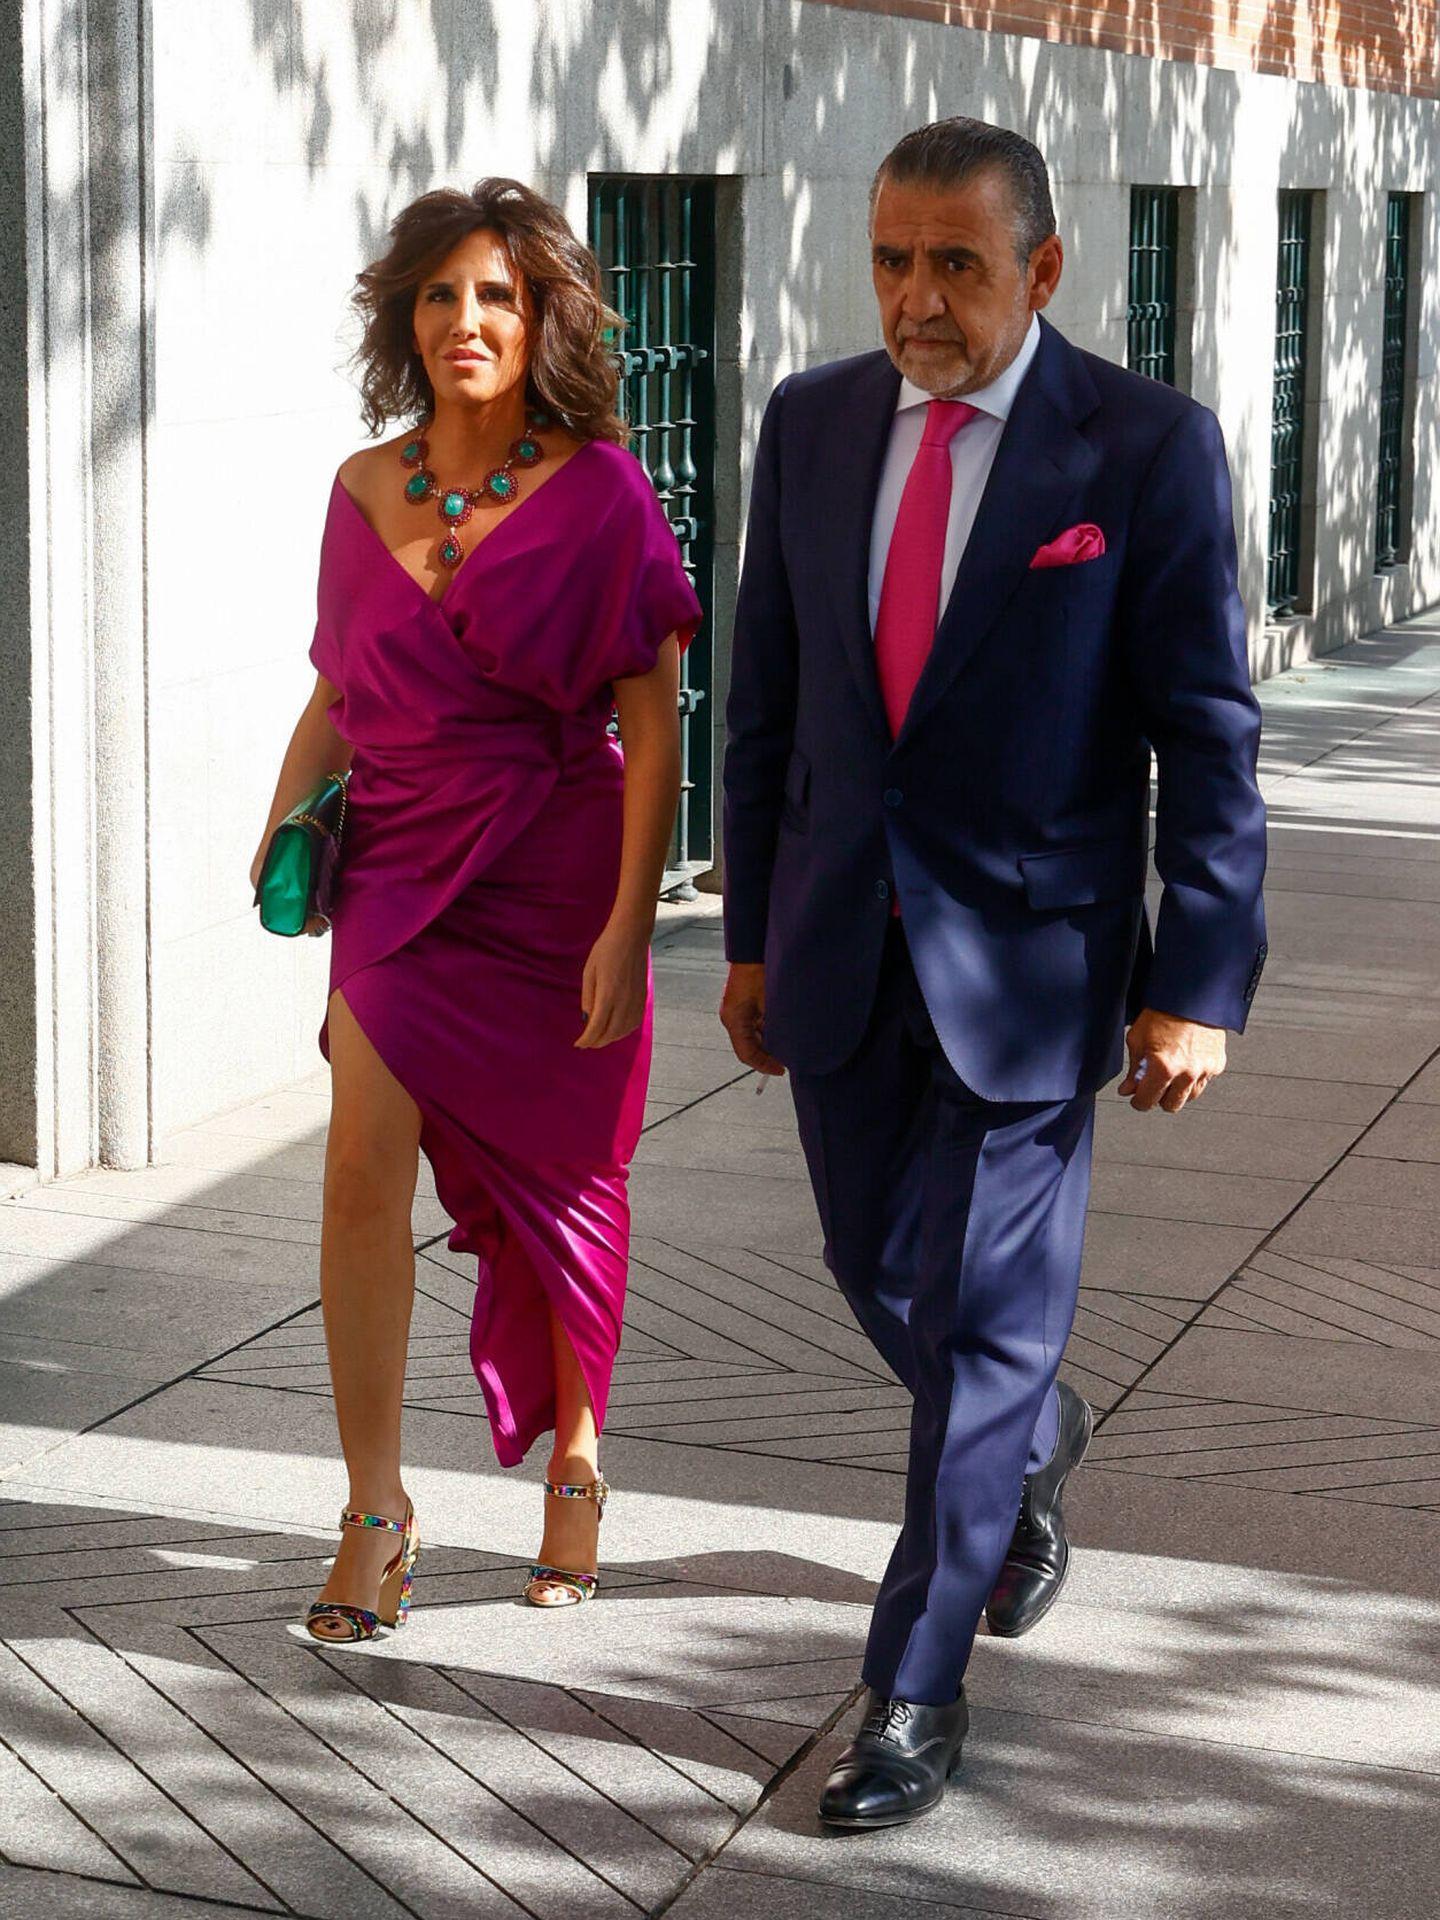 Jaime Martínez-Bordiú y su pareja, Marta Fernández. (Gtres)